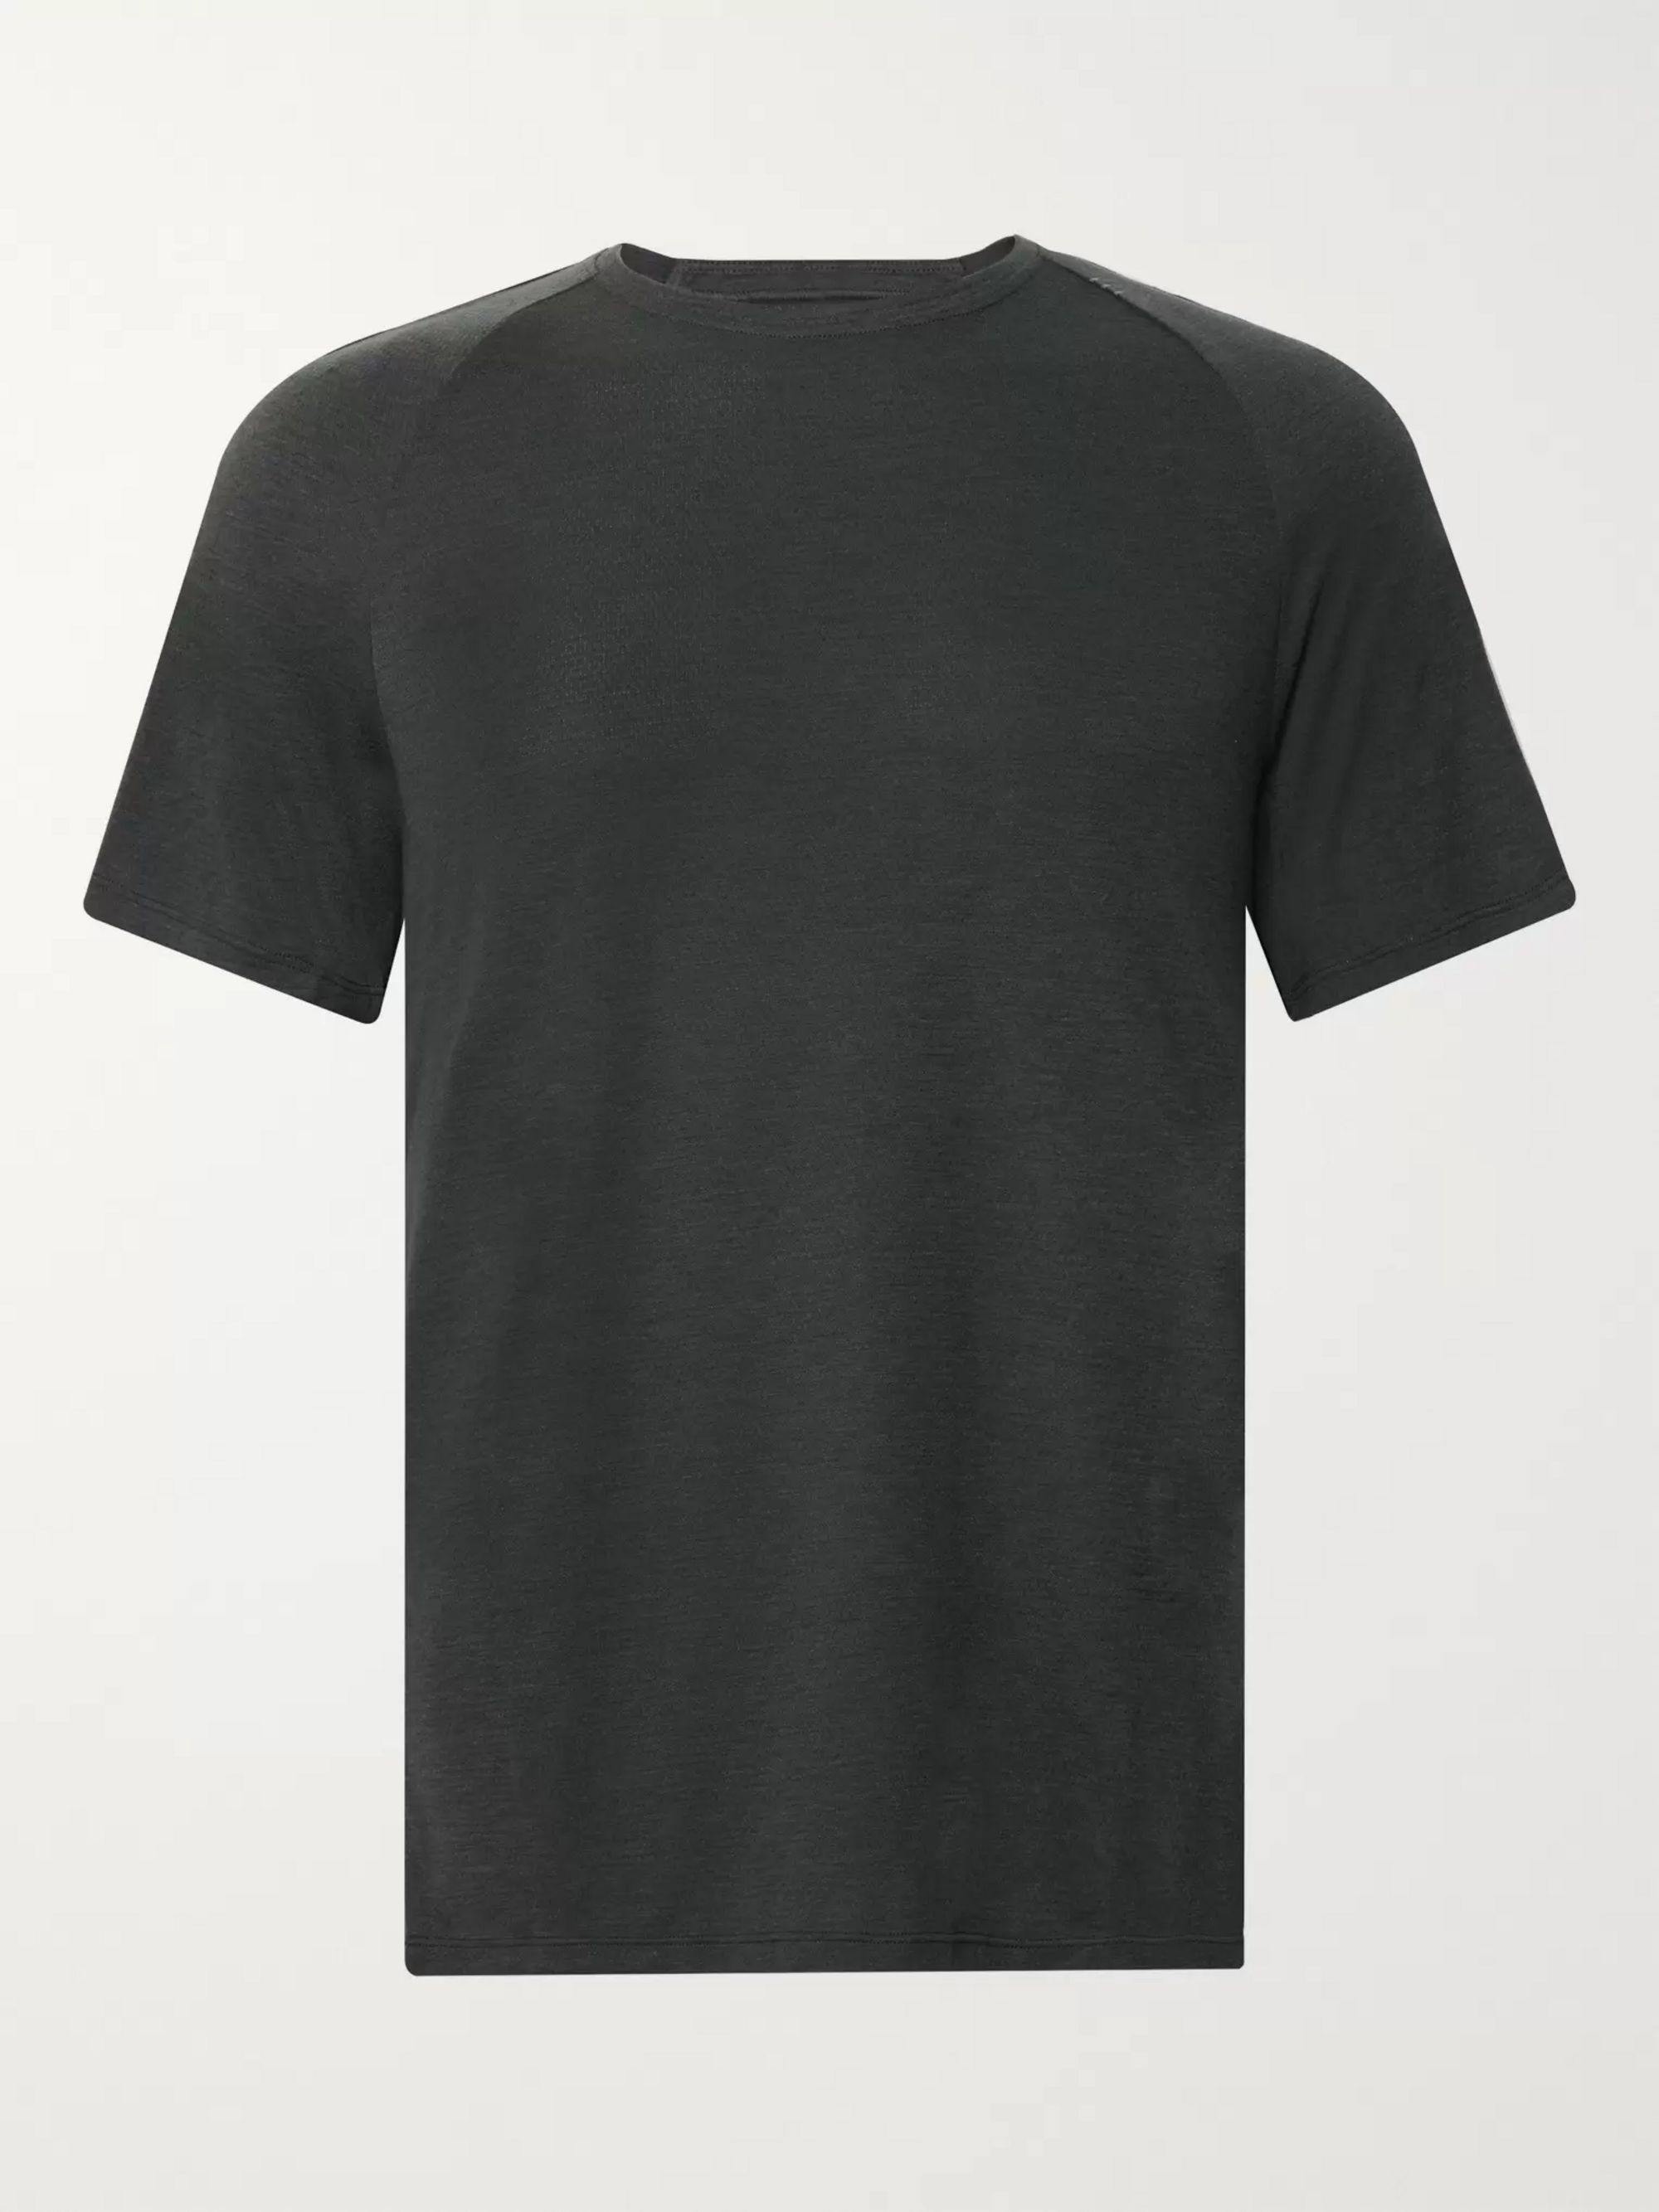 Conflux Mélange Stretch Jersey T Shirt by Lululemon